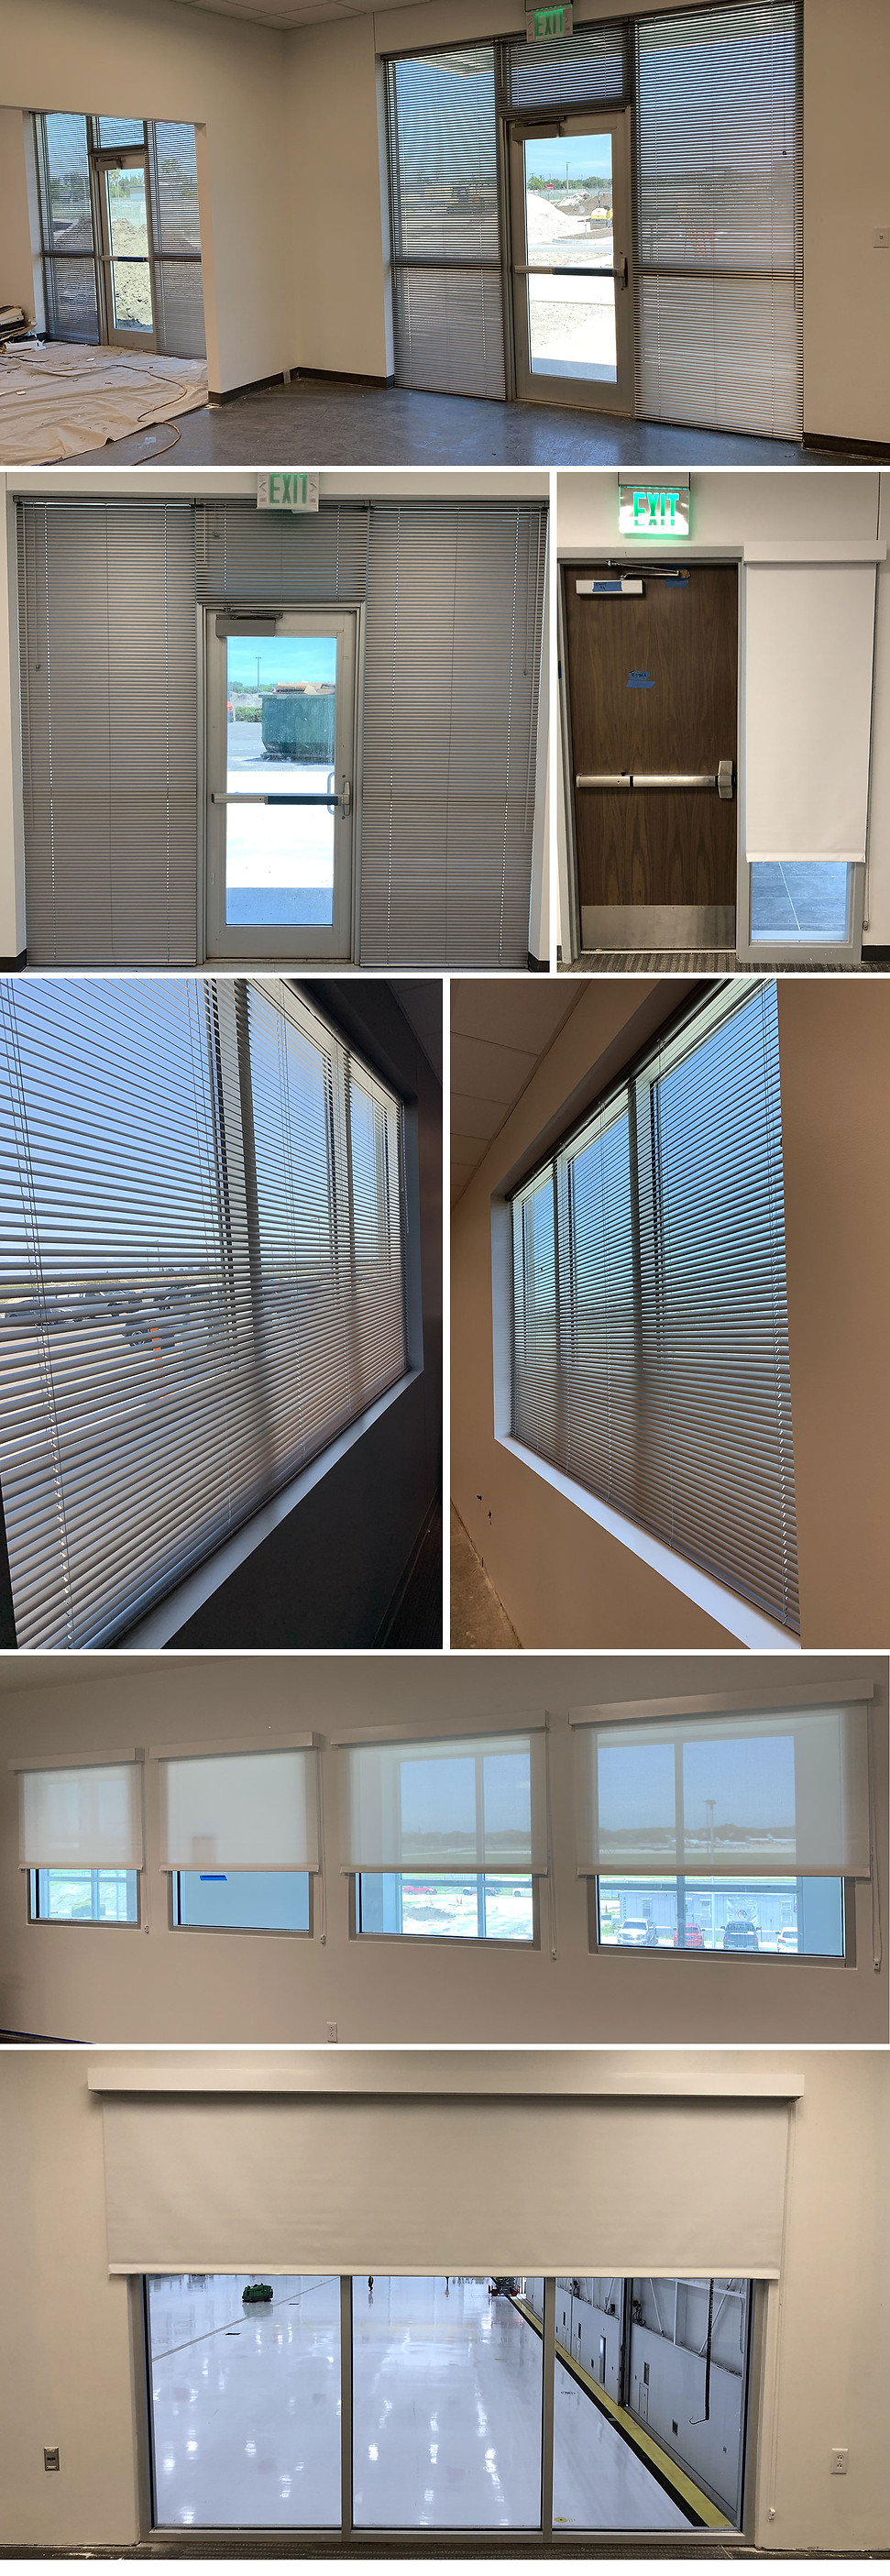 gulfstream-mro-window-treatment-commerci